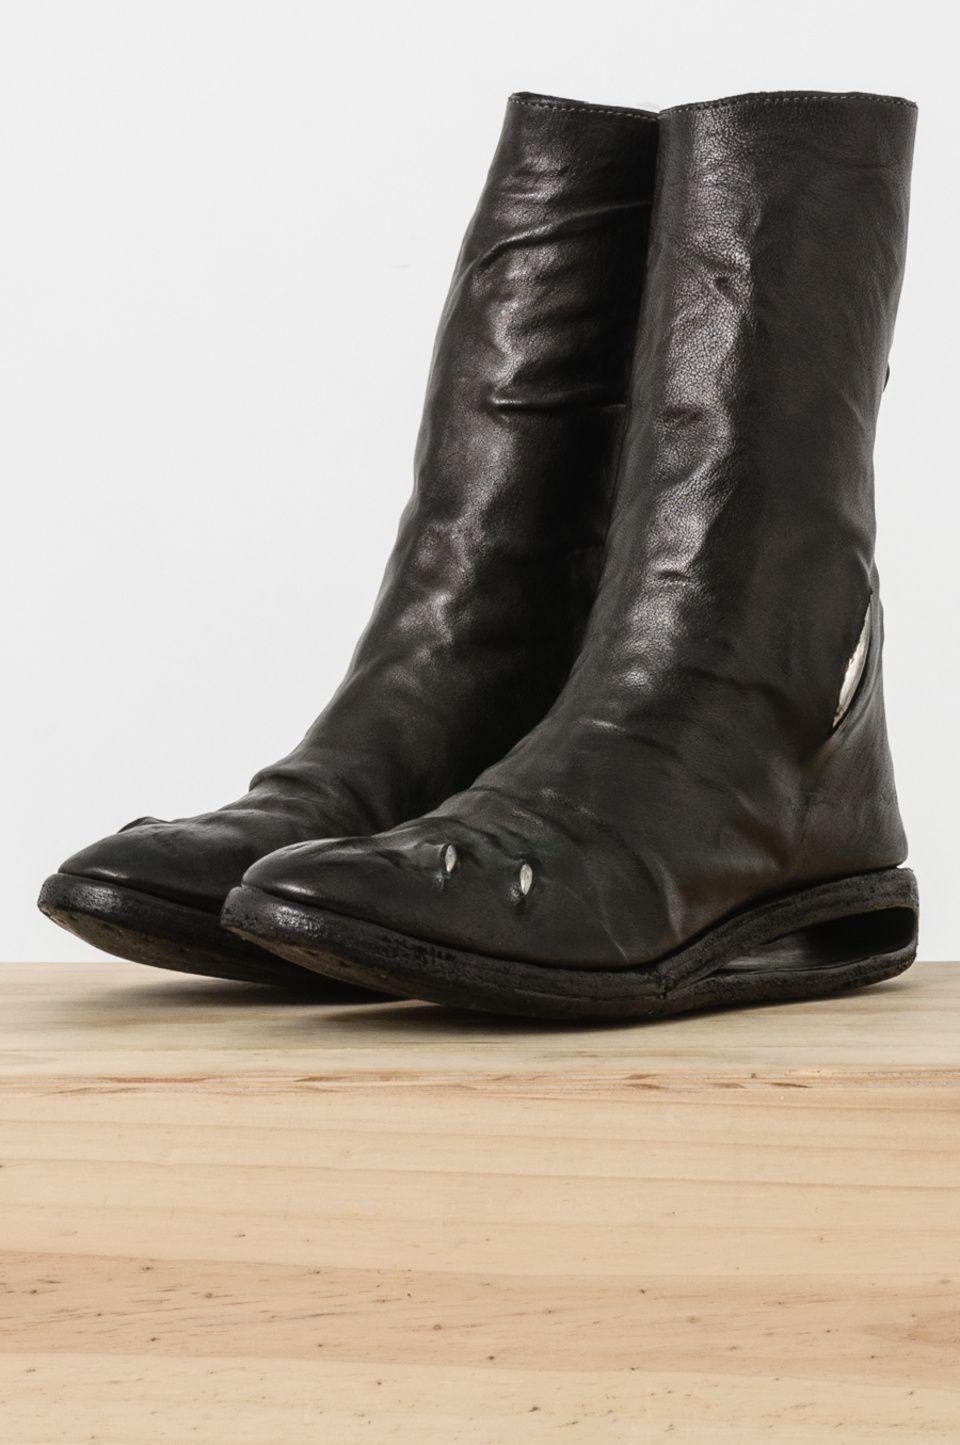 5558de9795a5d2 virginia-wolf-snake Carol Christian Poell kangaroo leather and titanium  boots